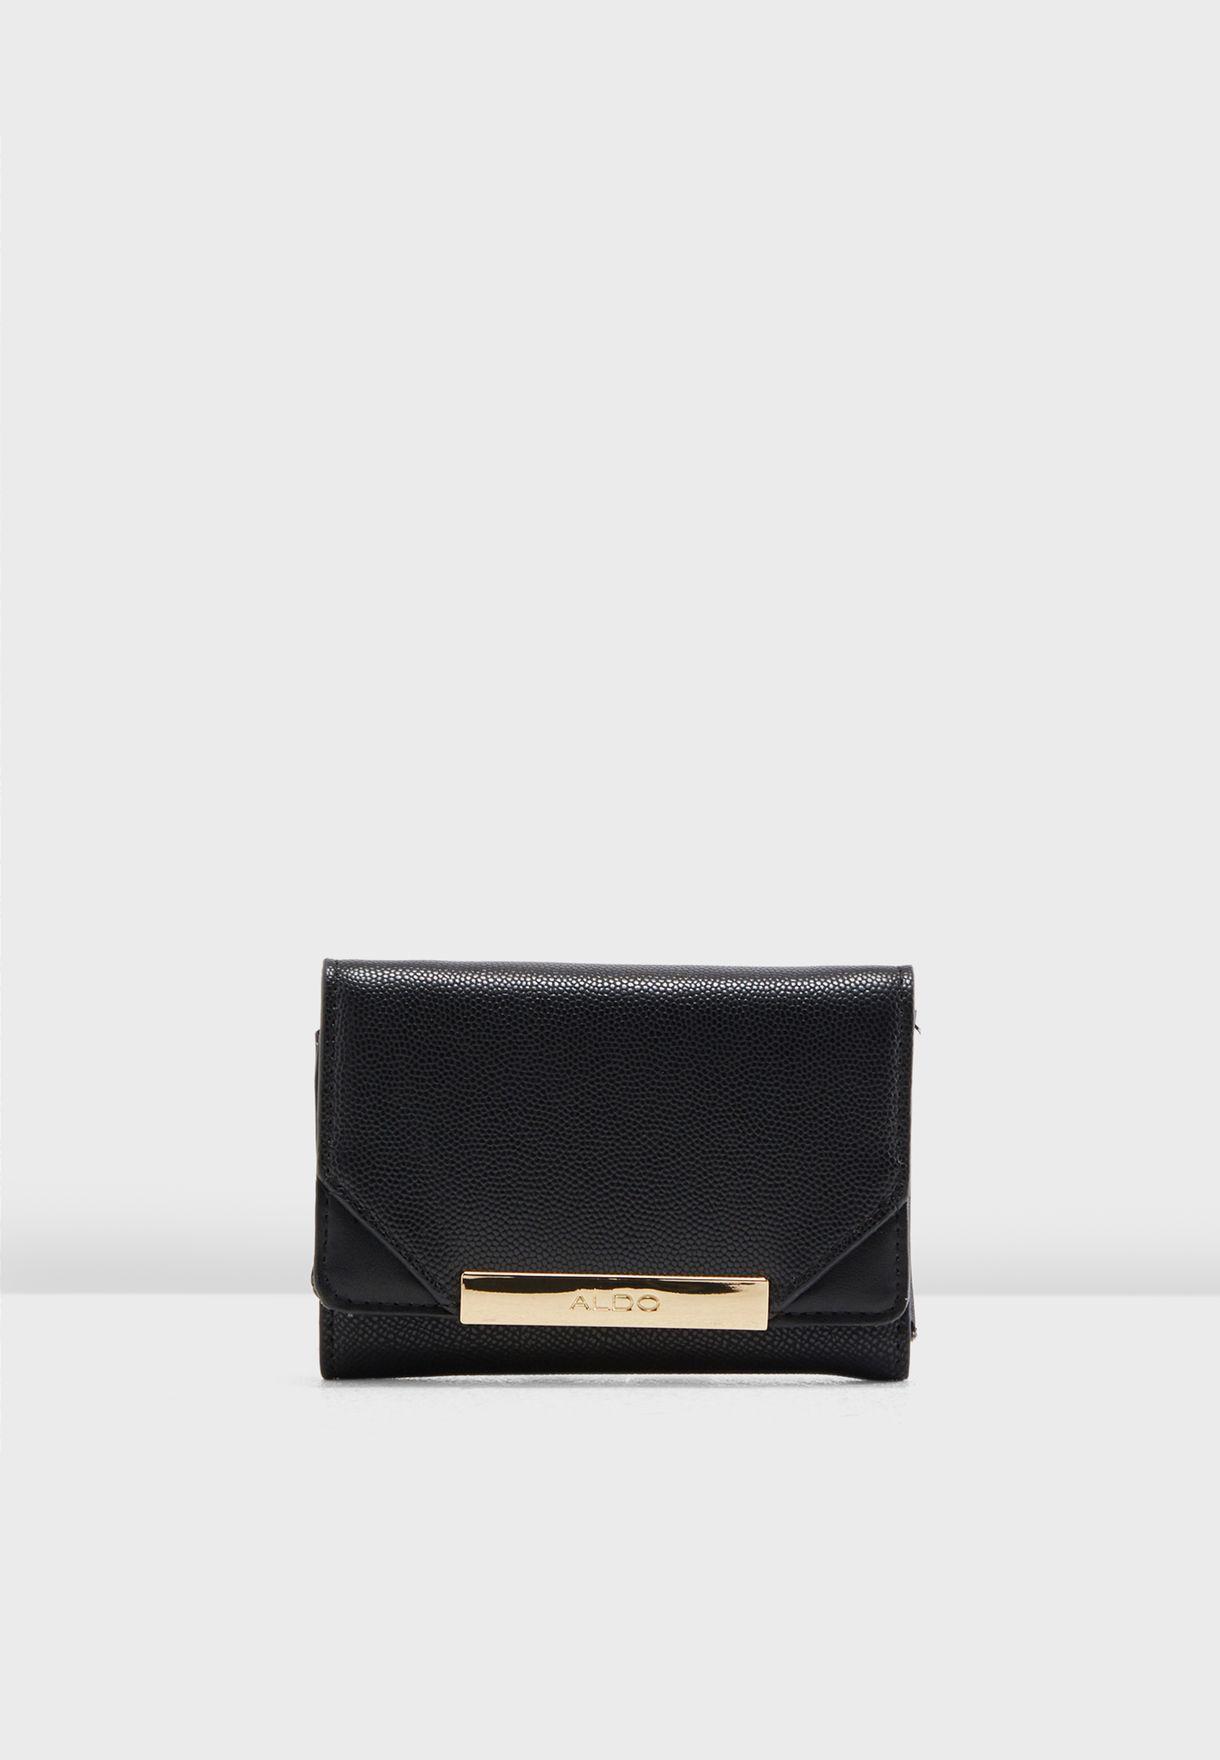 super popular 623b2 19c46 Shop Aldo black Decade Purse DECADE98 for Women in UAE - 17704AC89RCP